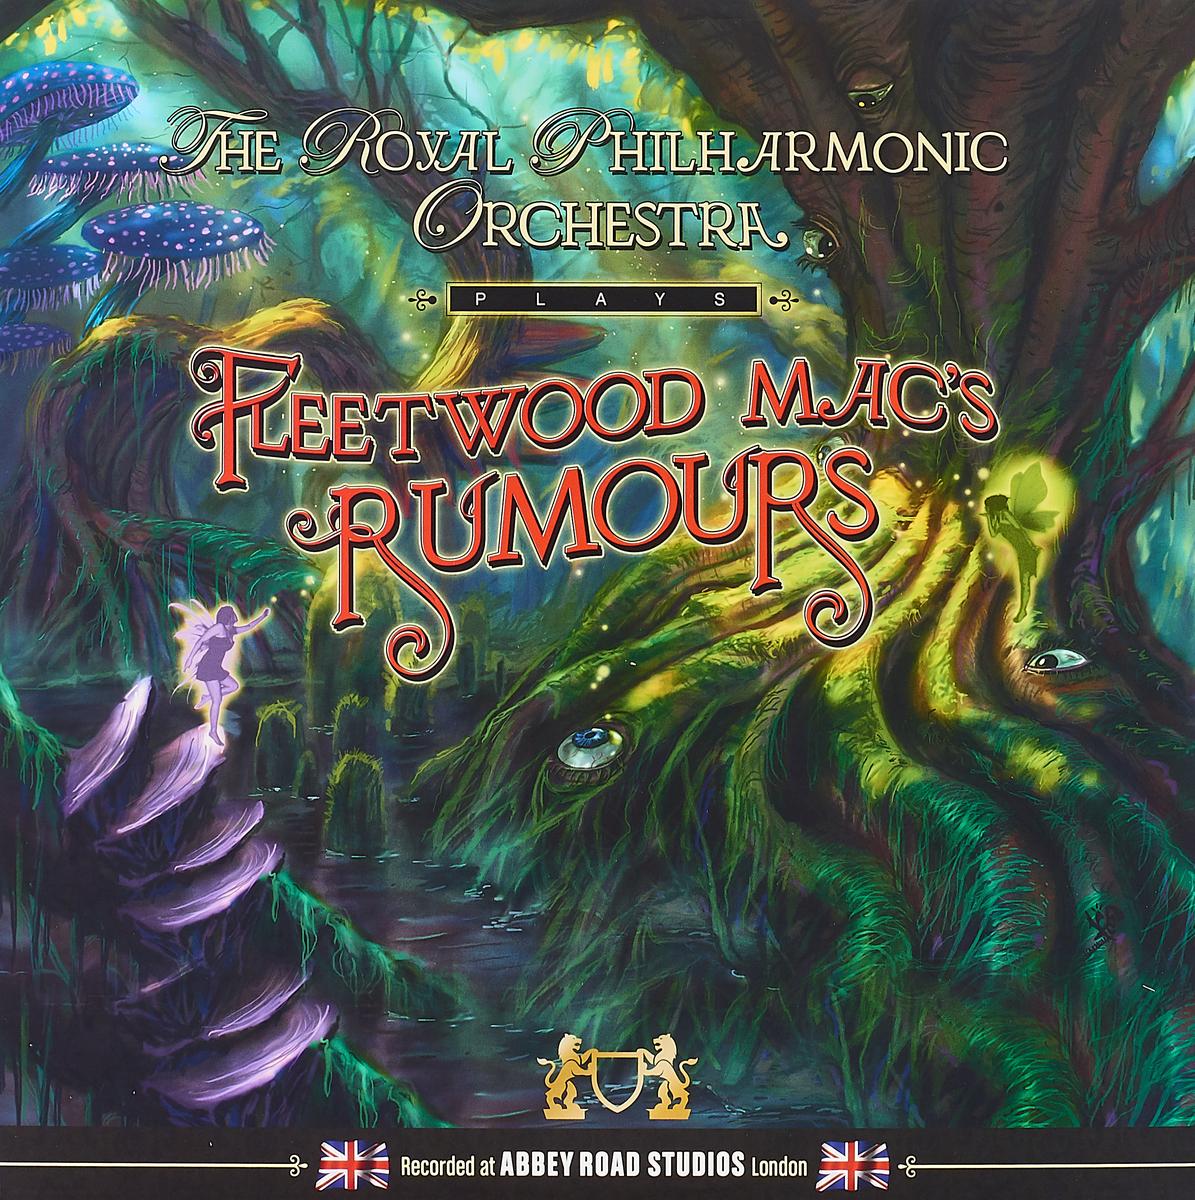 цена на The Royal Philharmonic Orchestra The Royal Philharmonic Orchestra. Plays Fleetwood Mac's Rumours (LP)